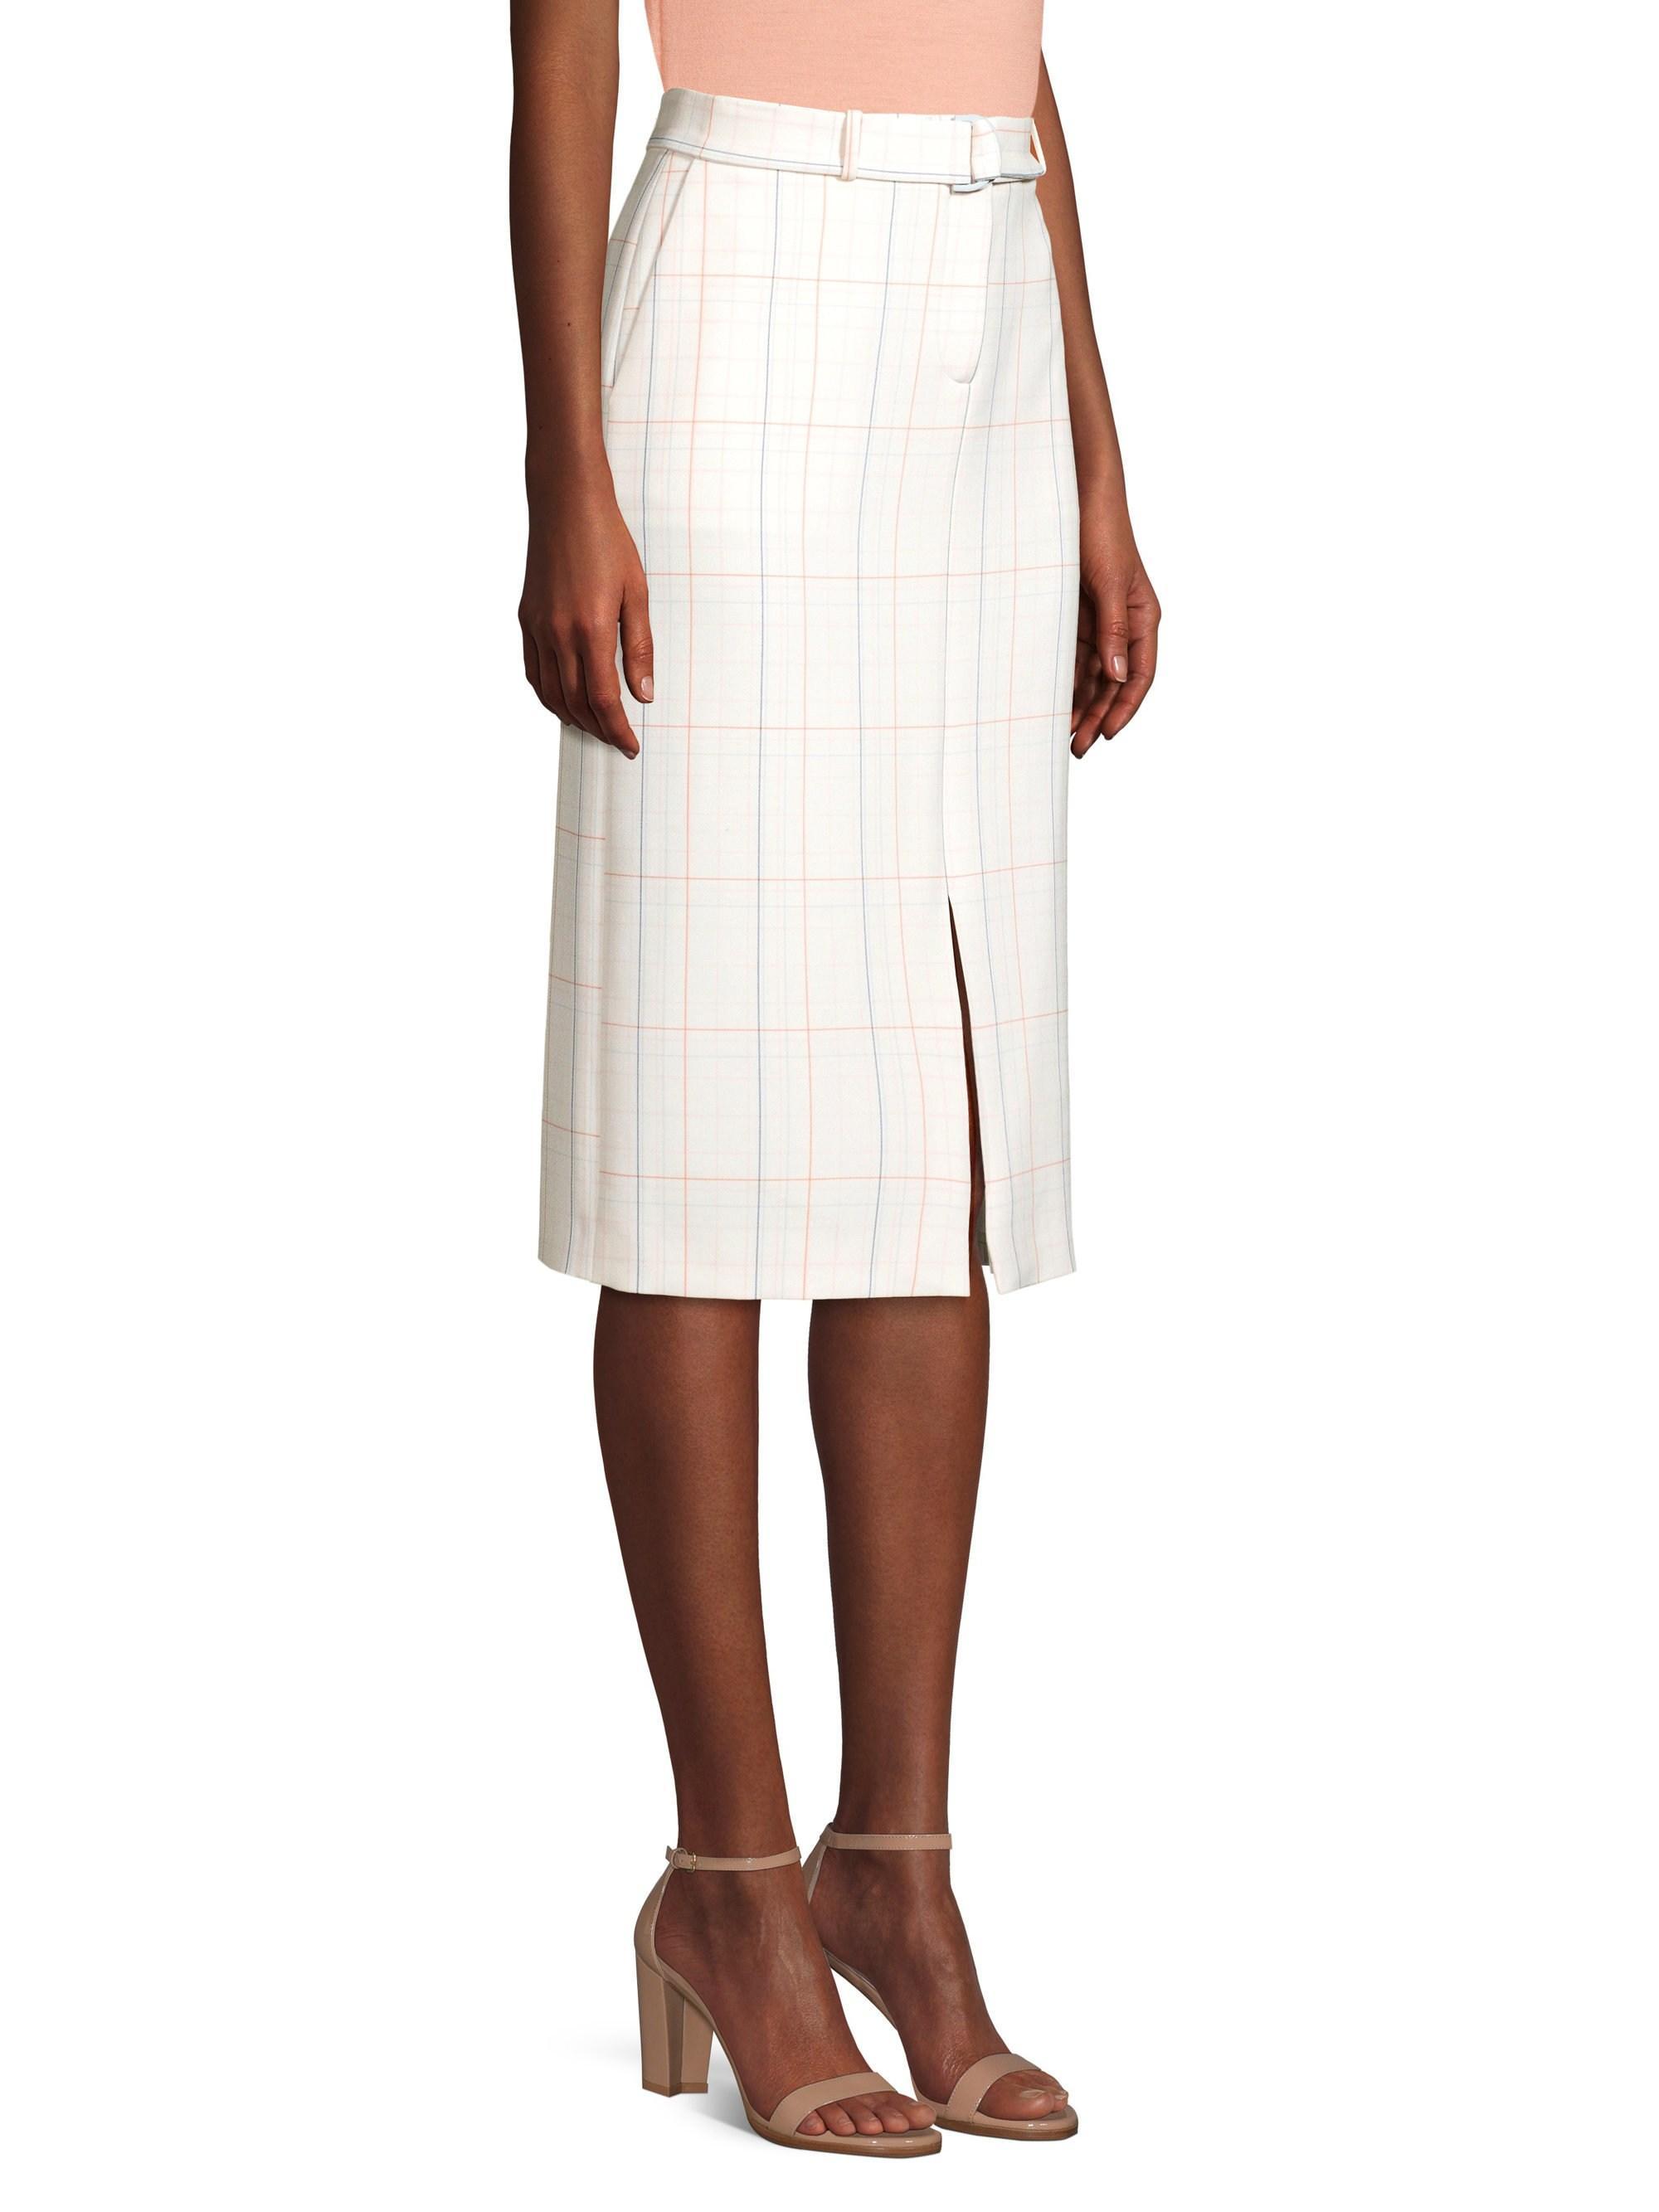 abc84c2459 Lyst - BOSS Women's Ponte Check Long Pencil Skirt - Vanilla Light - Size 0  in White